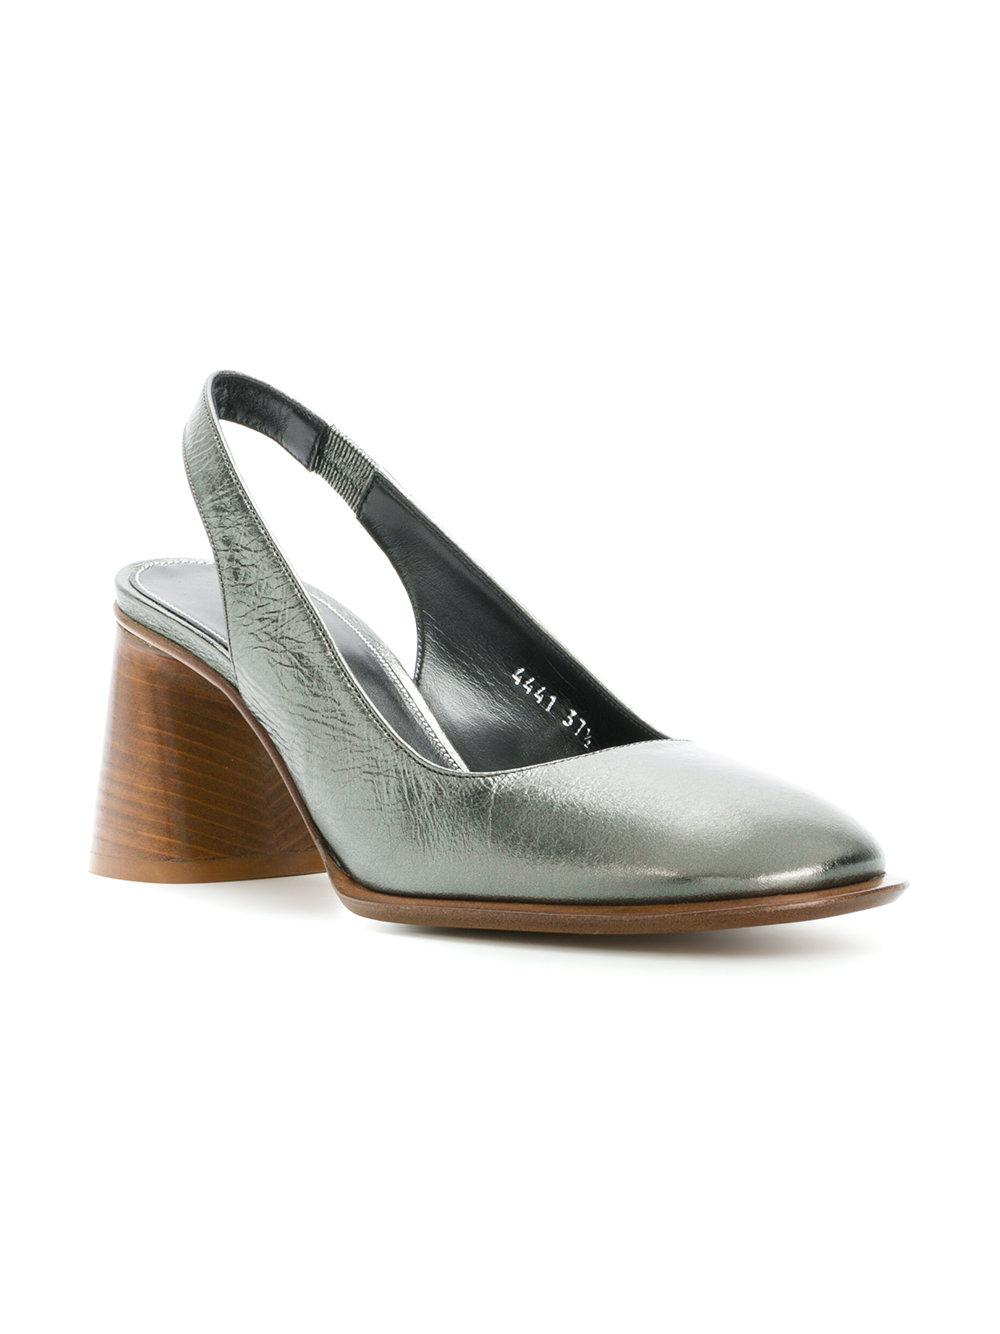 Buy Cheap Pay With Paypal Sale Order mid-heel slingback pumps - Metallic Premiata Buy Online New m9ugPdi